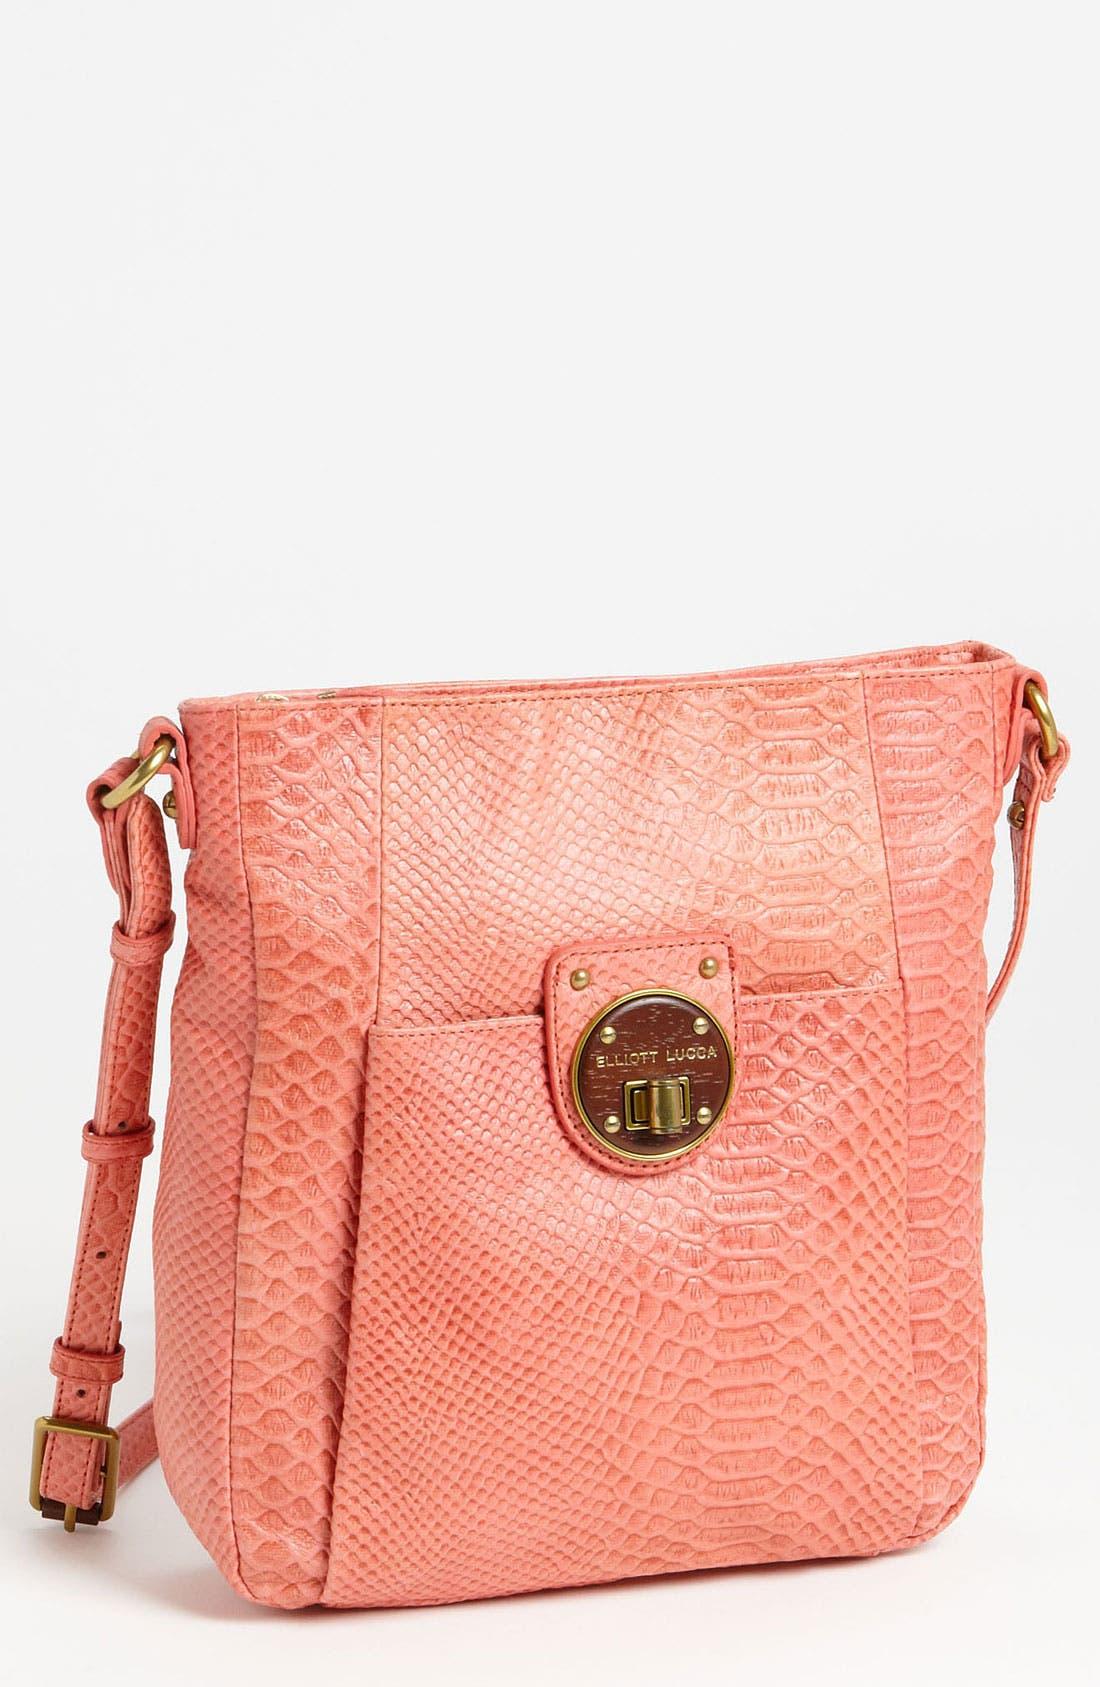 Alternate Image 1 Selected - Elliott Lucca 'Magdalena' Crossbody Bag